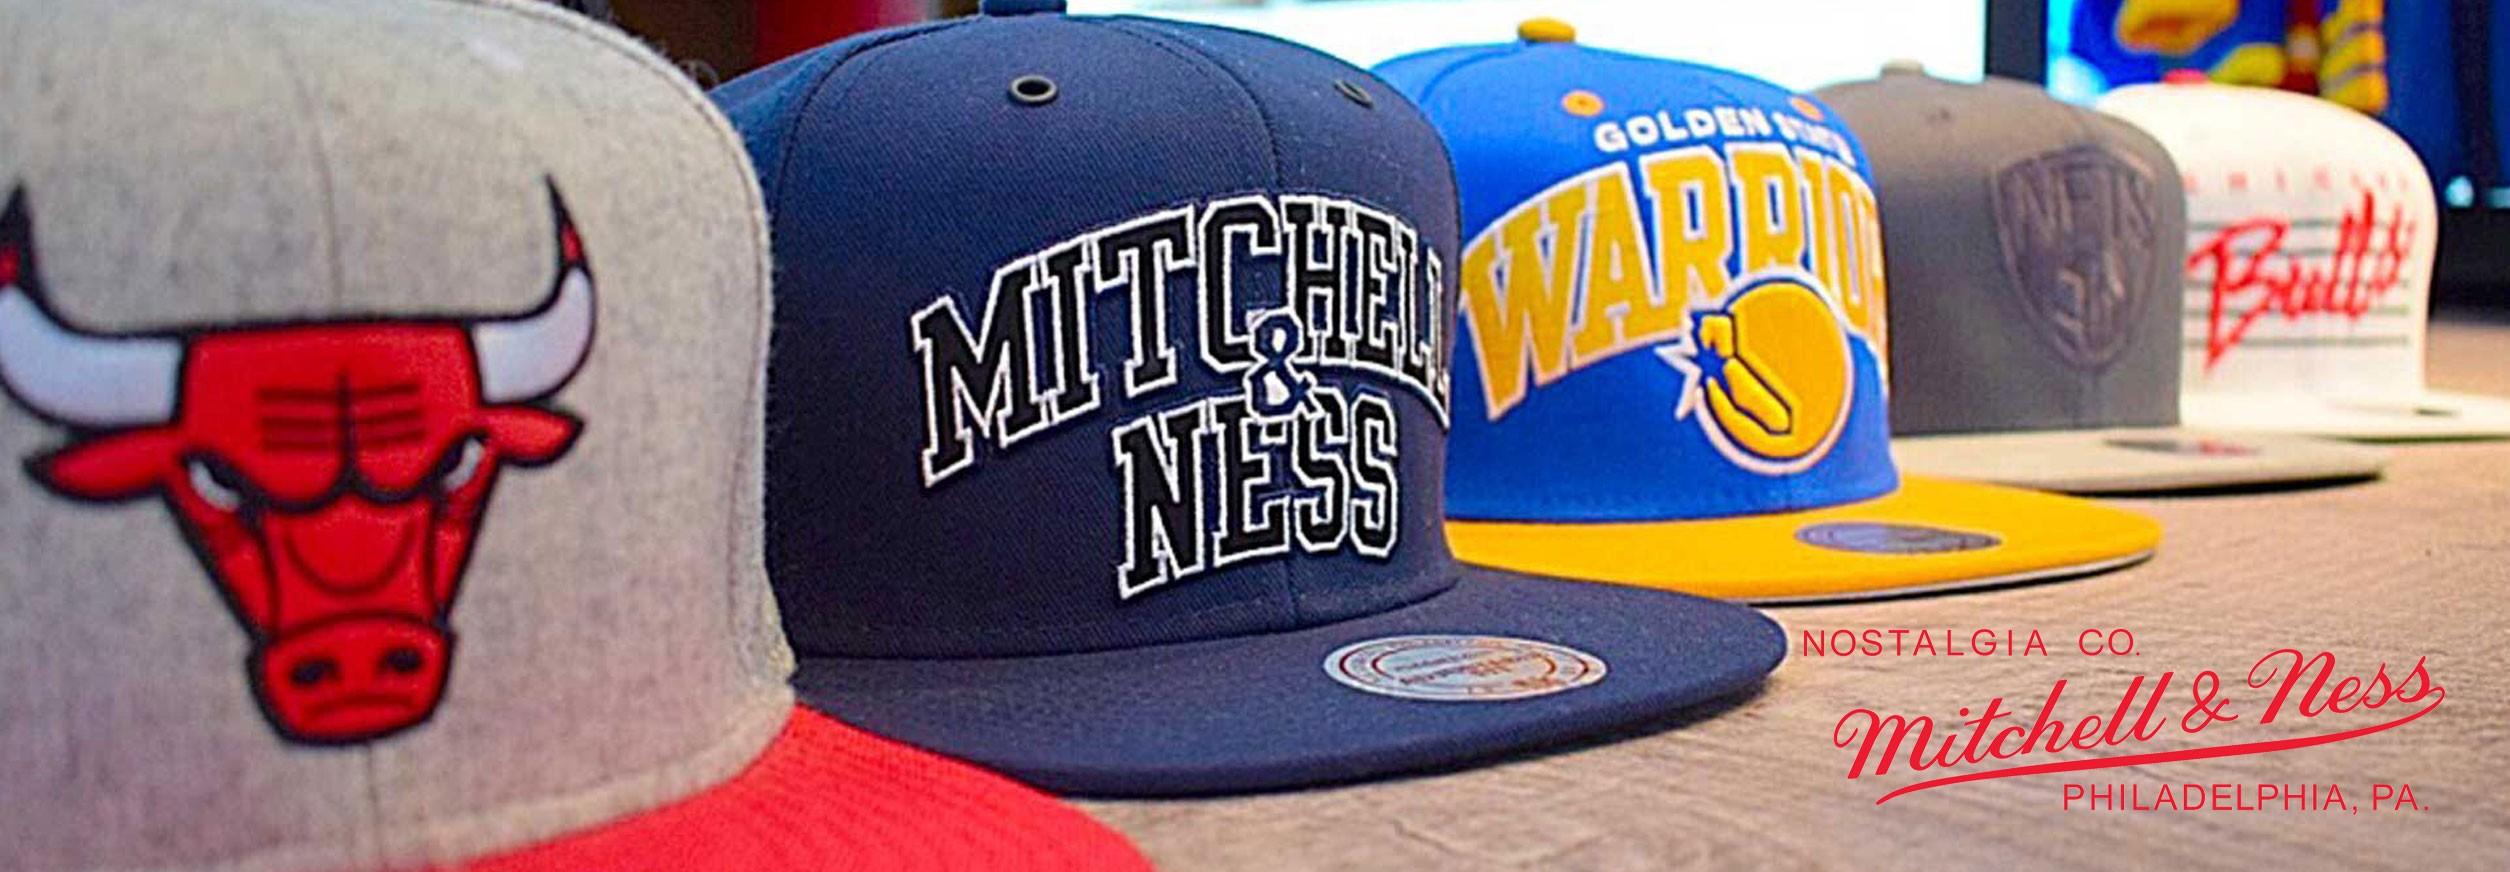 mitchell-ness